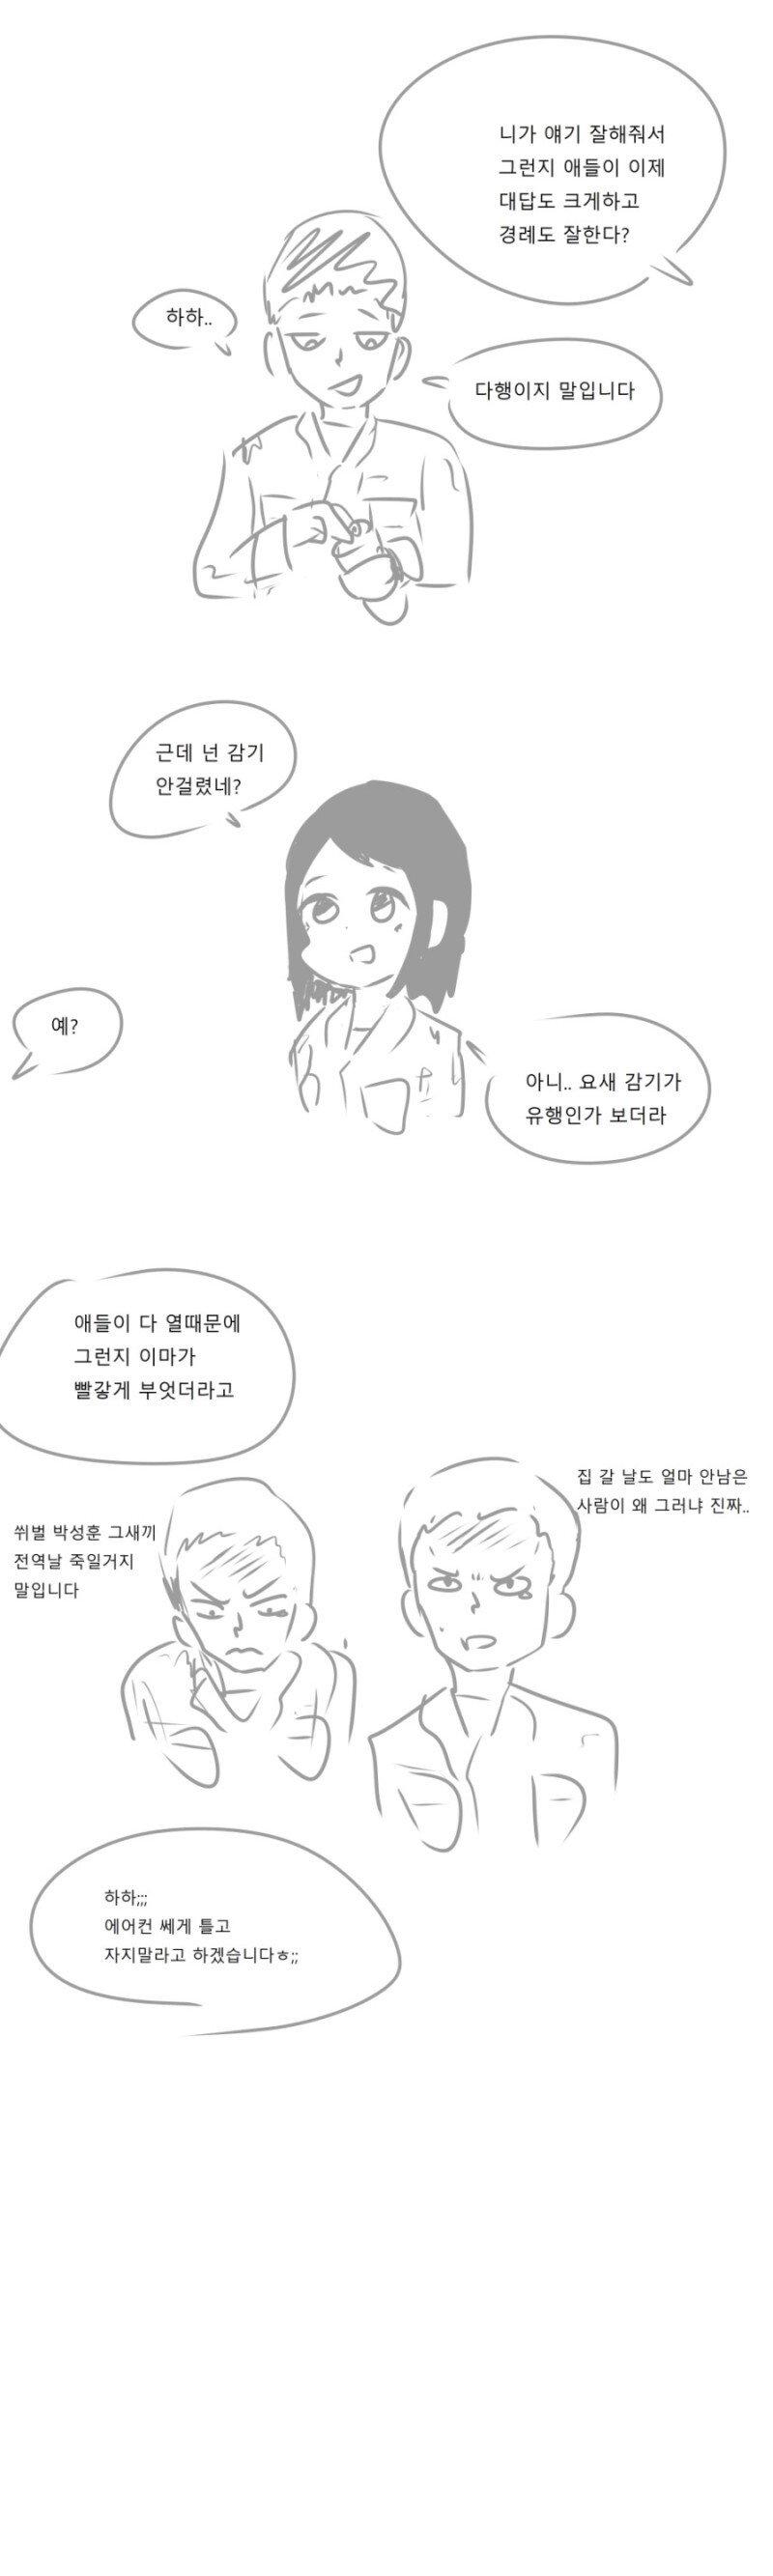 9.jpg 신임소대장이 커여운 여군인.Manhwa